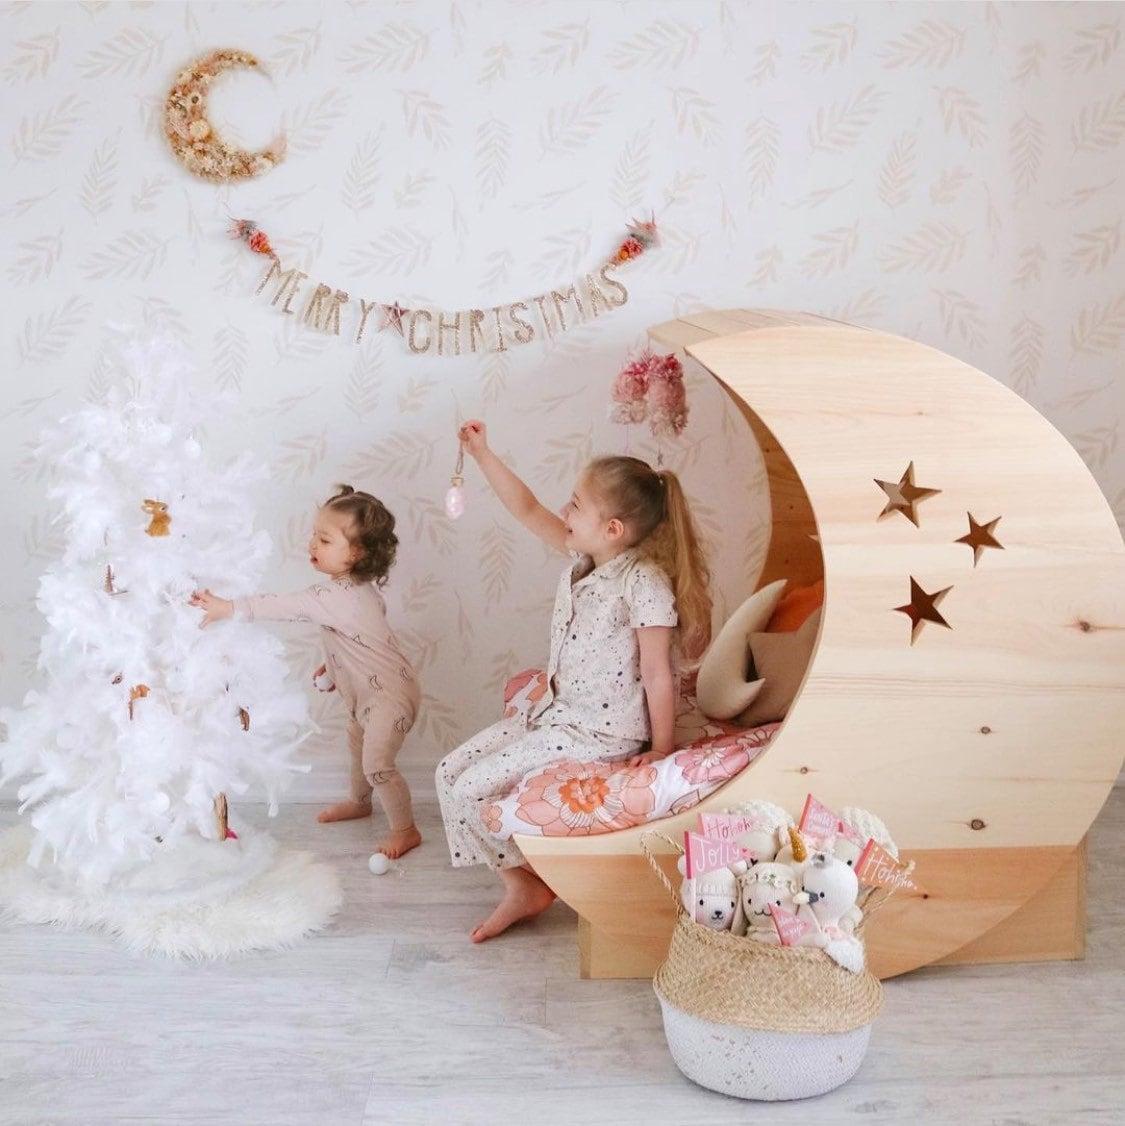 trendy kids room wallpaper delivered worldwide von livetteskids